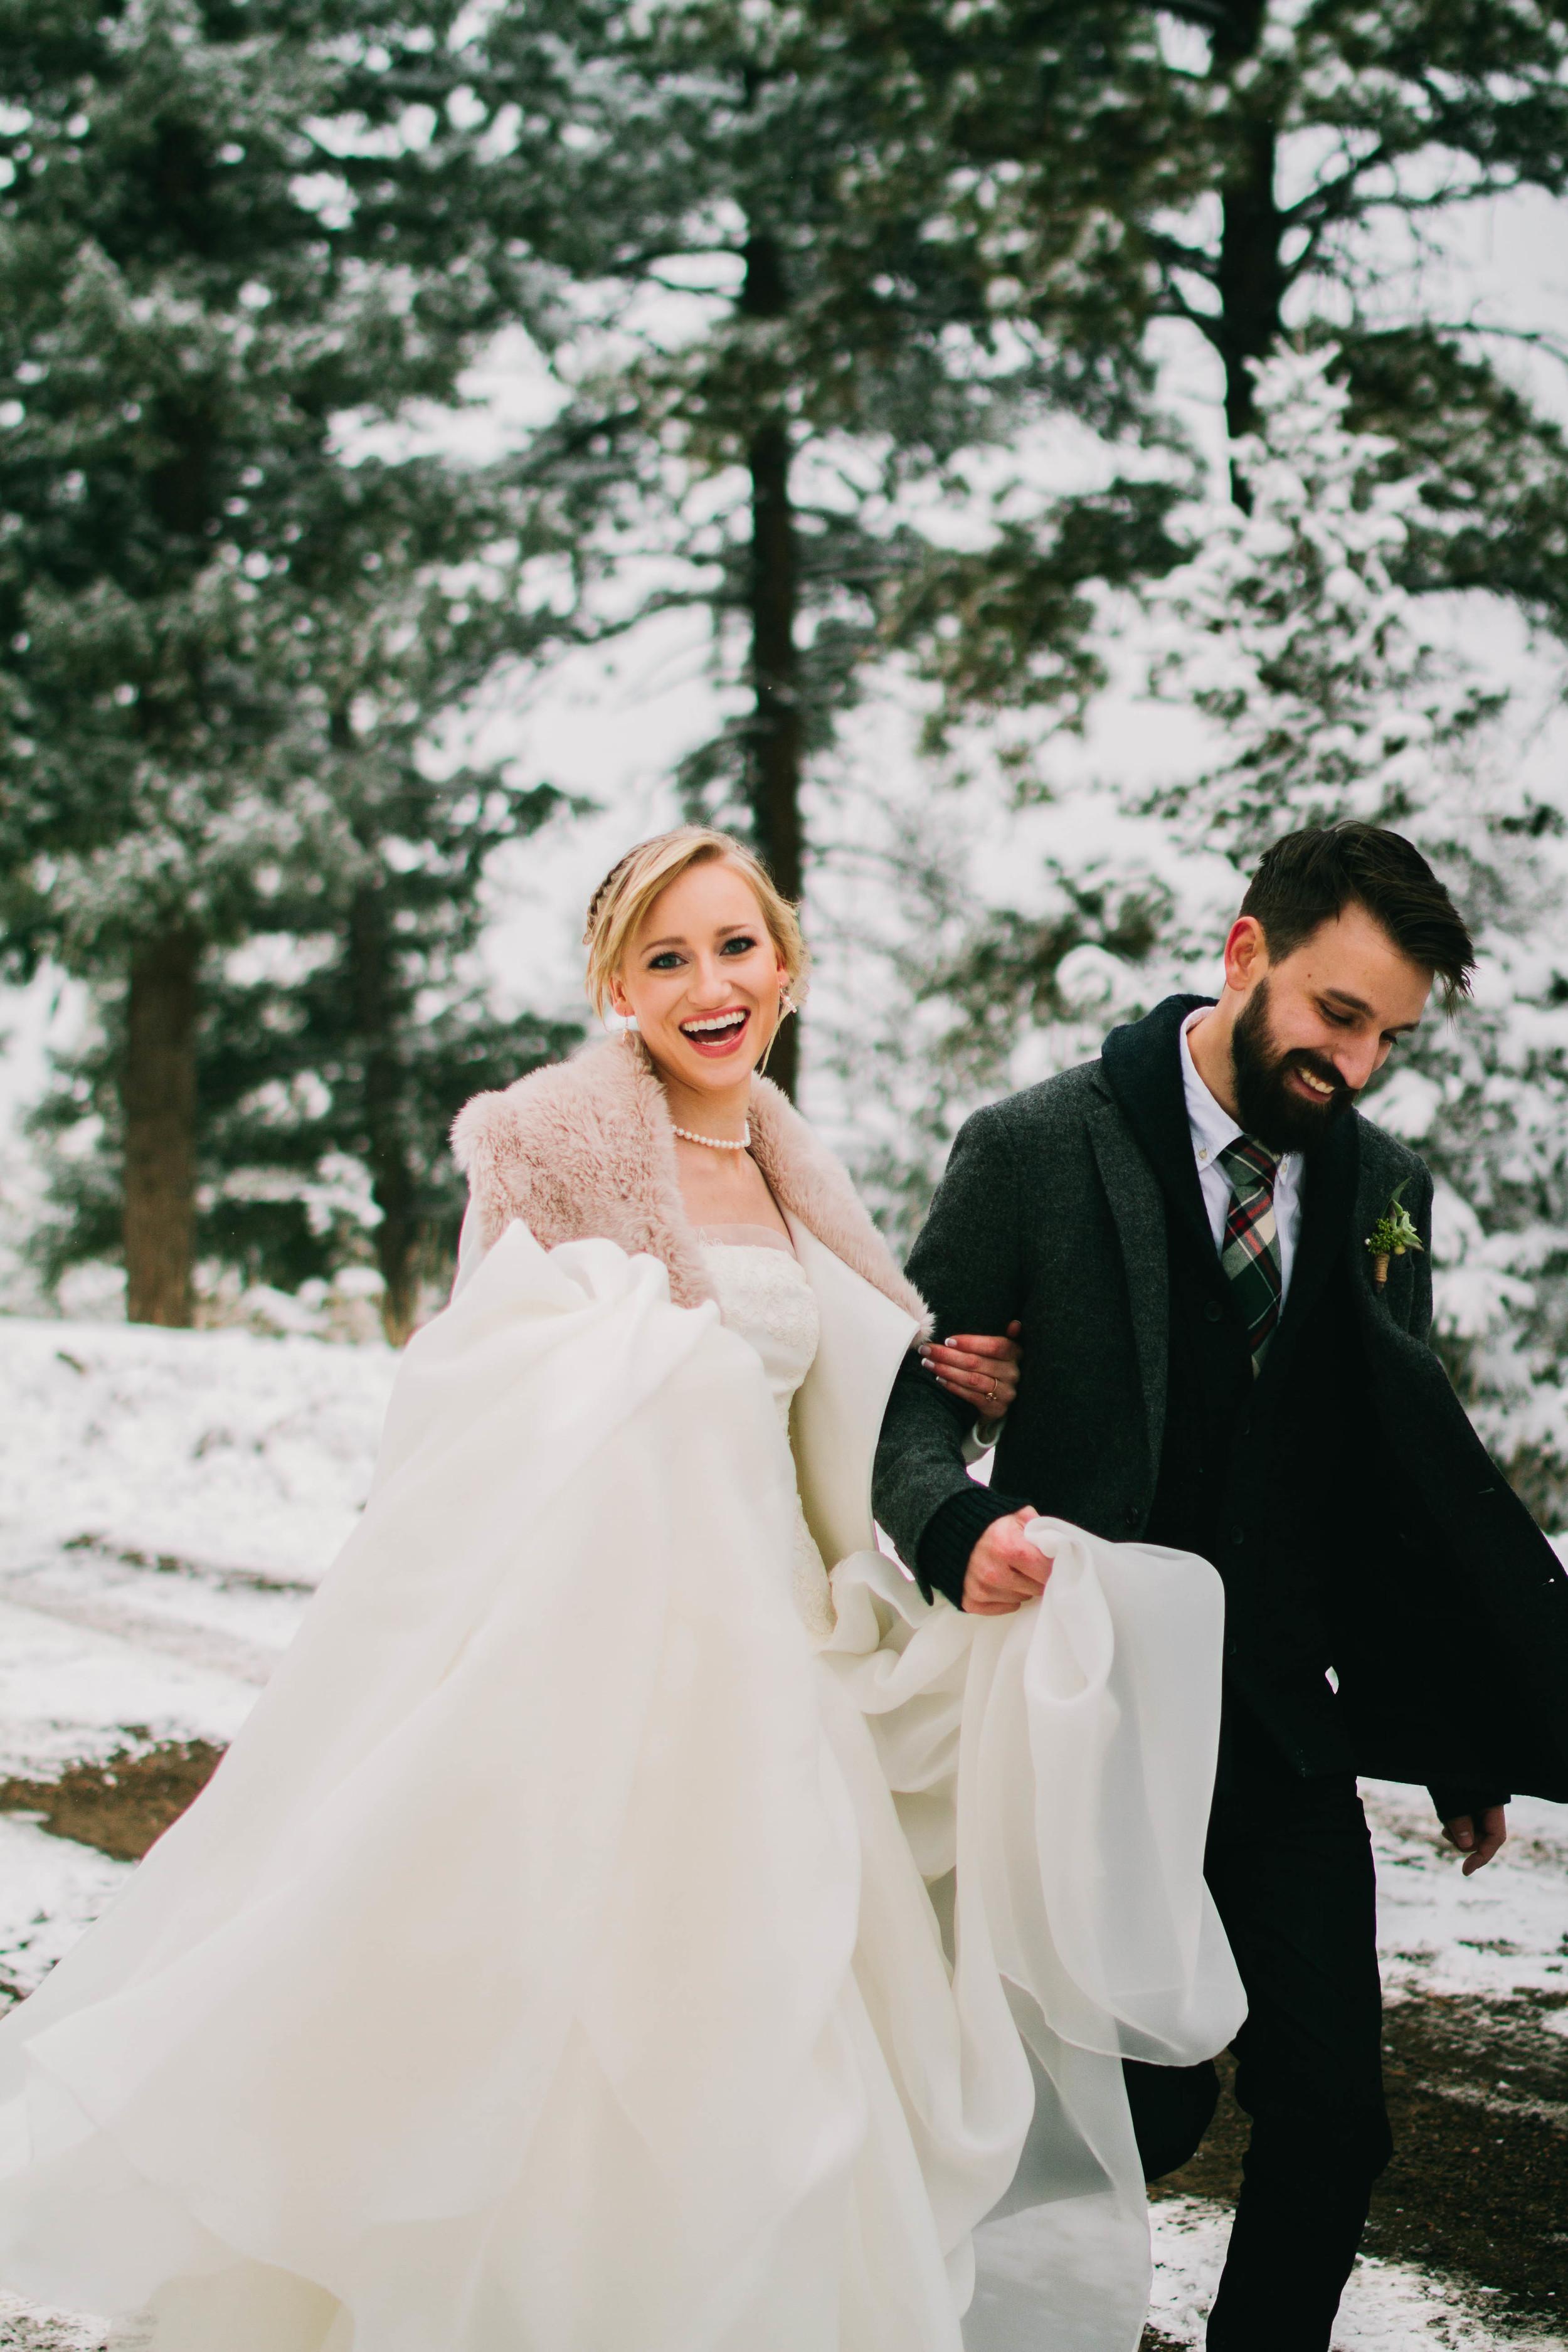 Bonin Wedding - Madeleine Bonin Photography-5847.jpg